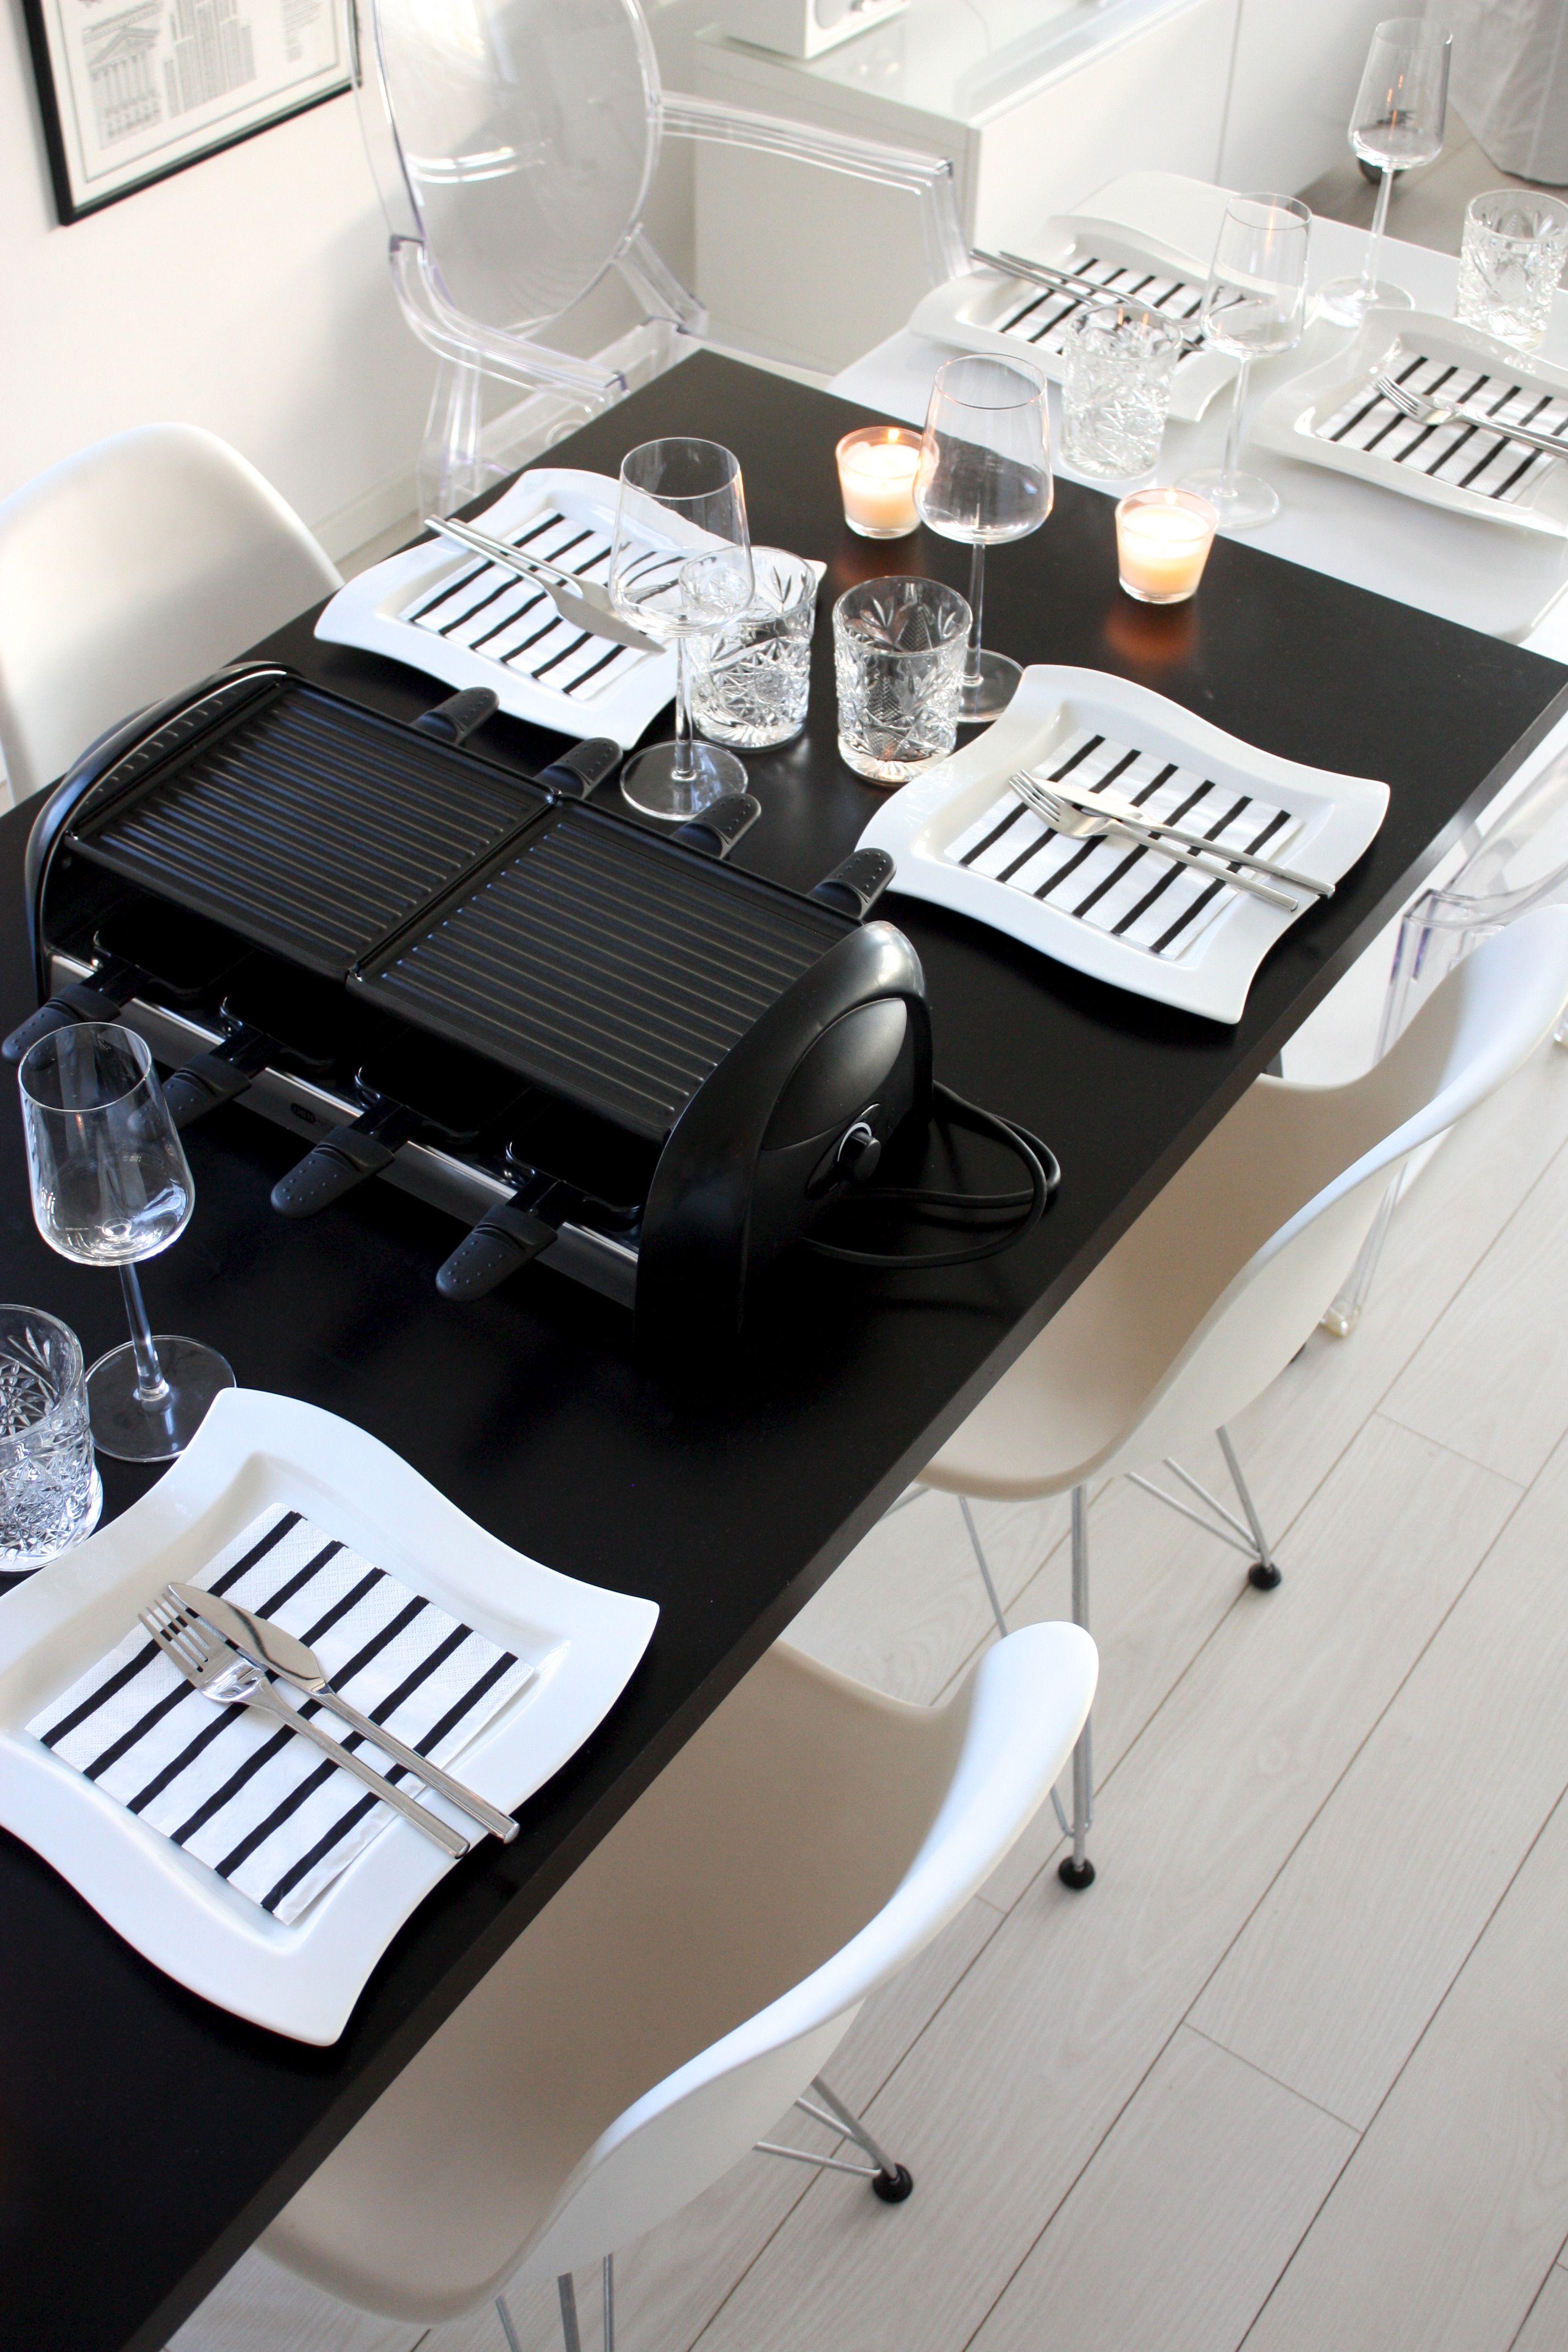 homevialaura | raclette night | table setting | Villeroy Boch New Wave plates | Iittala Essence & Raclette-ilta | Night table Iittala and Dinnerware